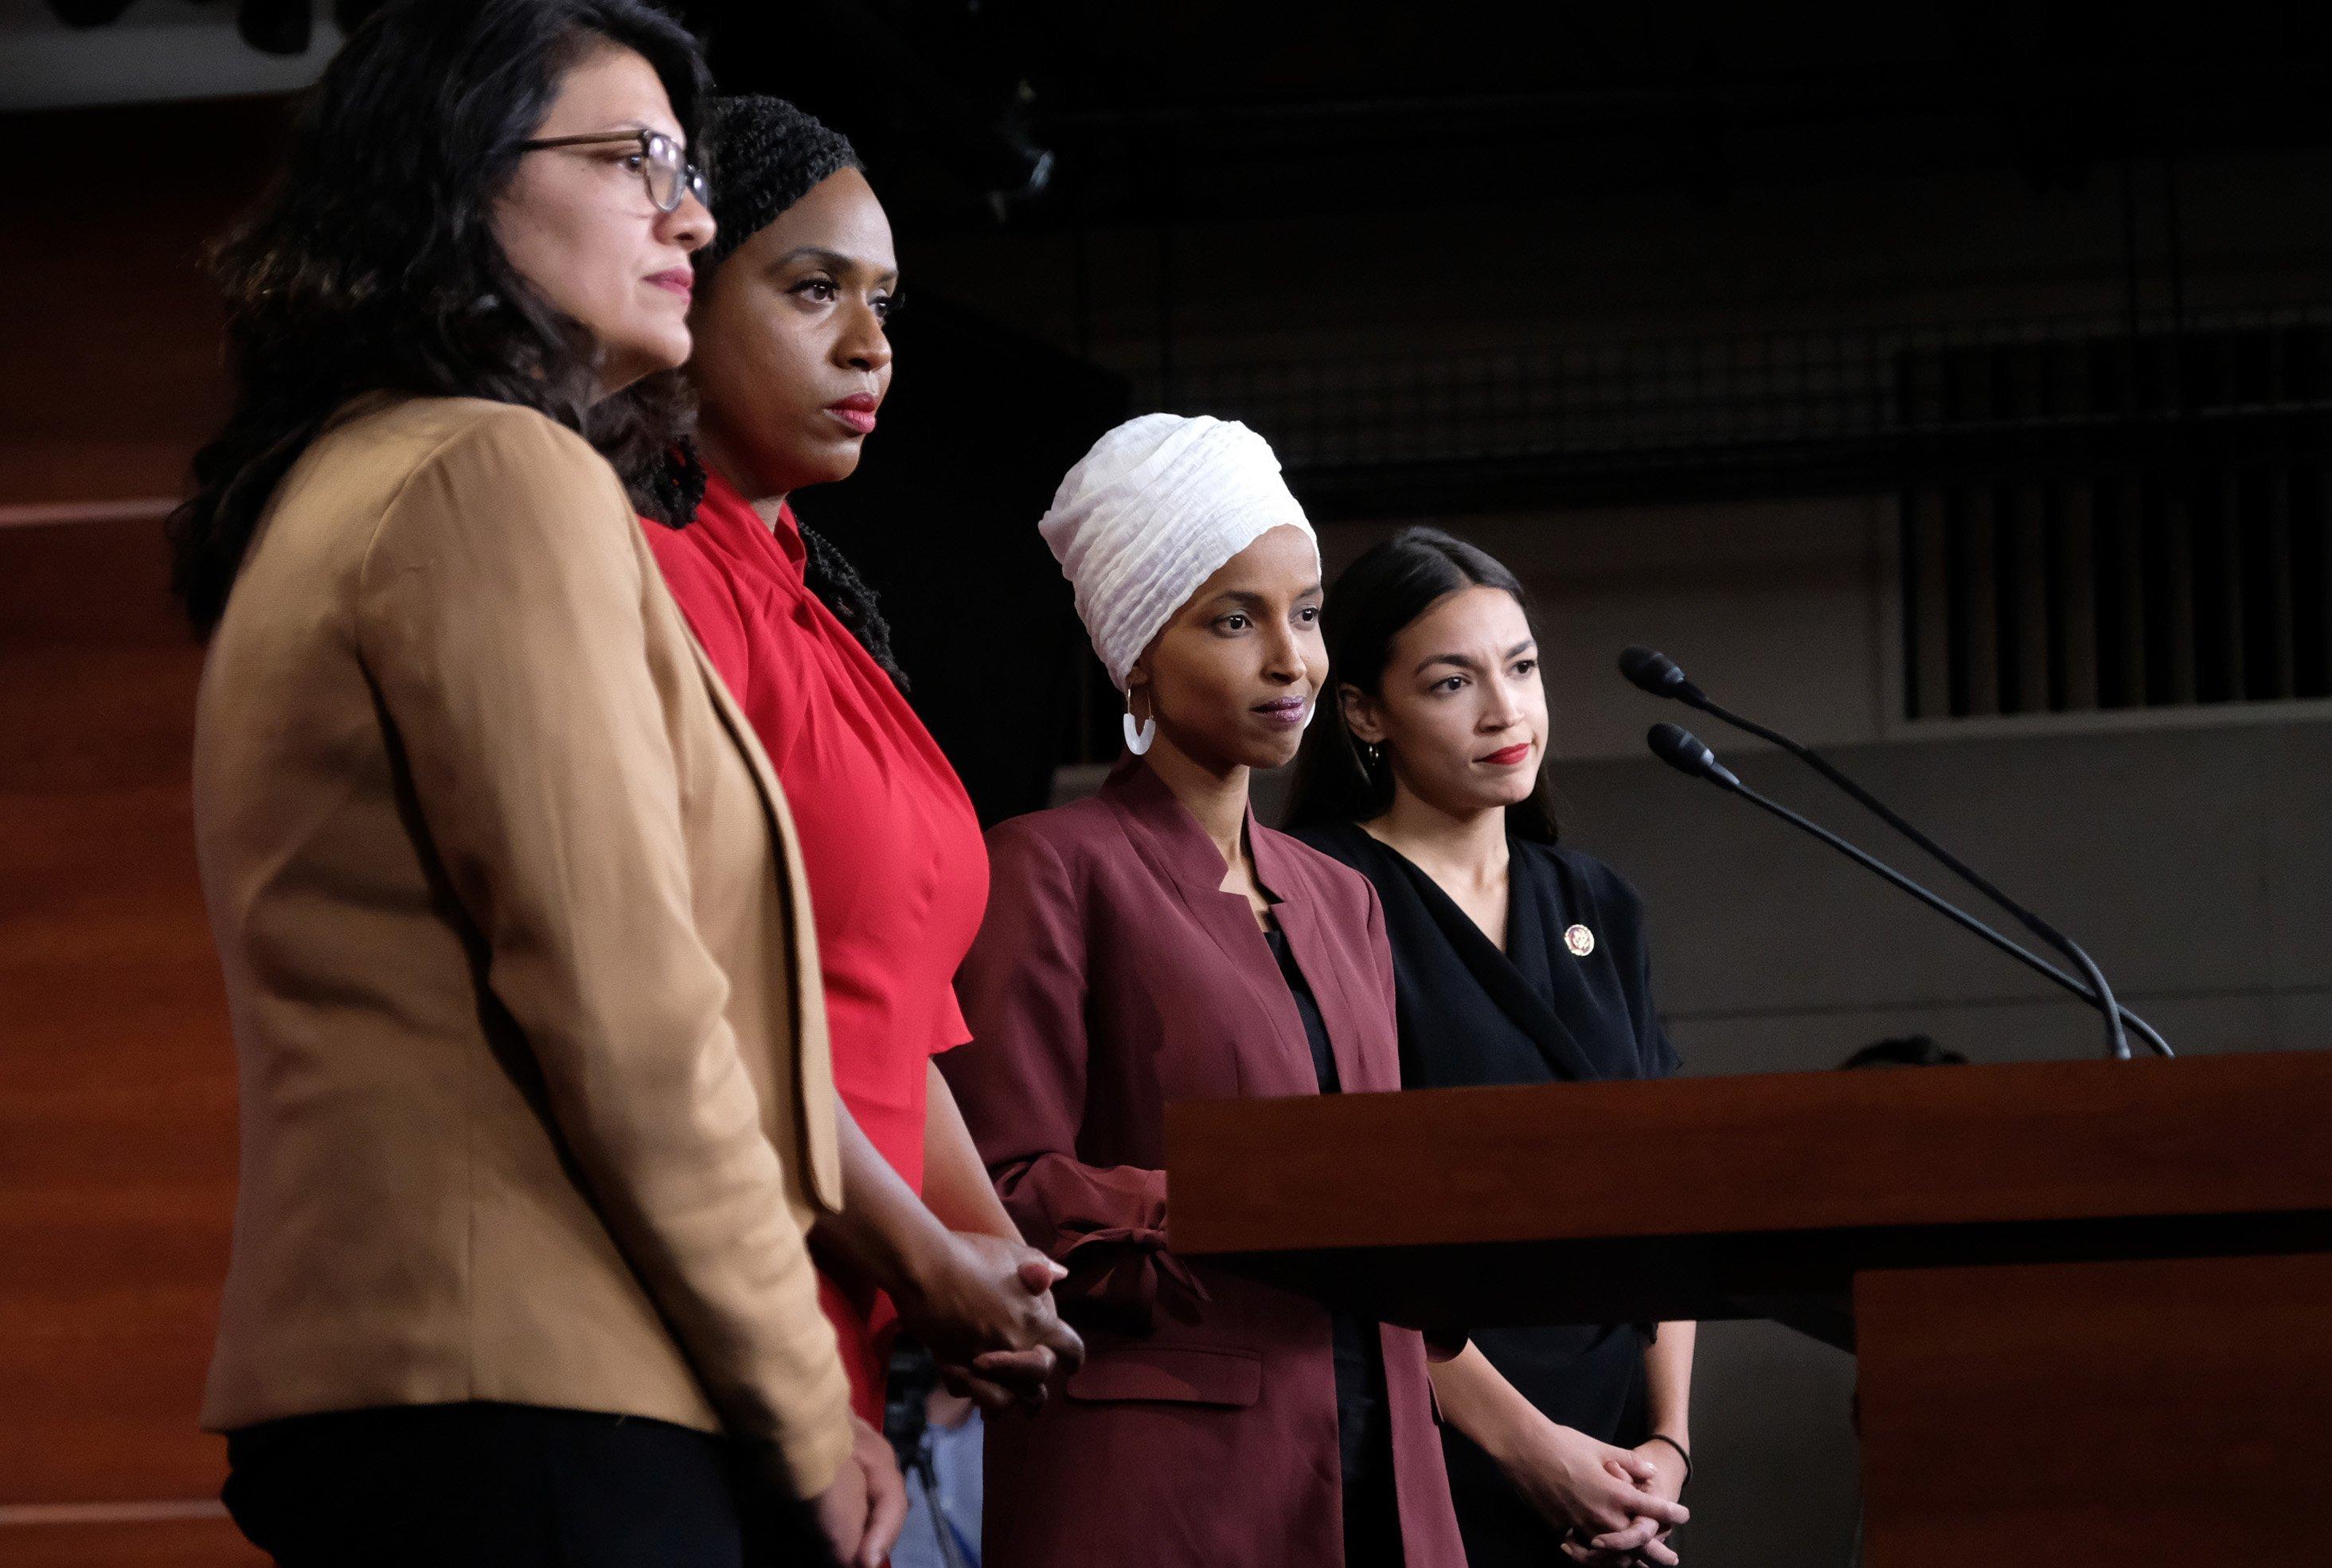 Illinois GOP group shares meme depicting minority Dem congresswomen as 'the jihad squad'